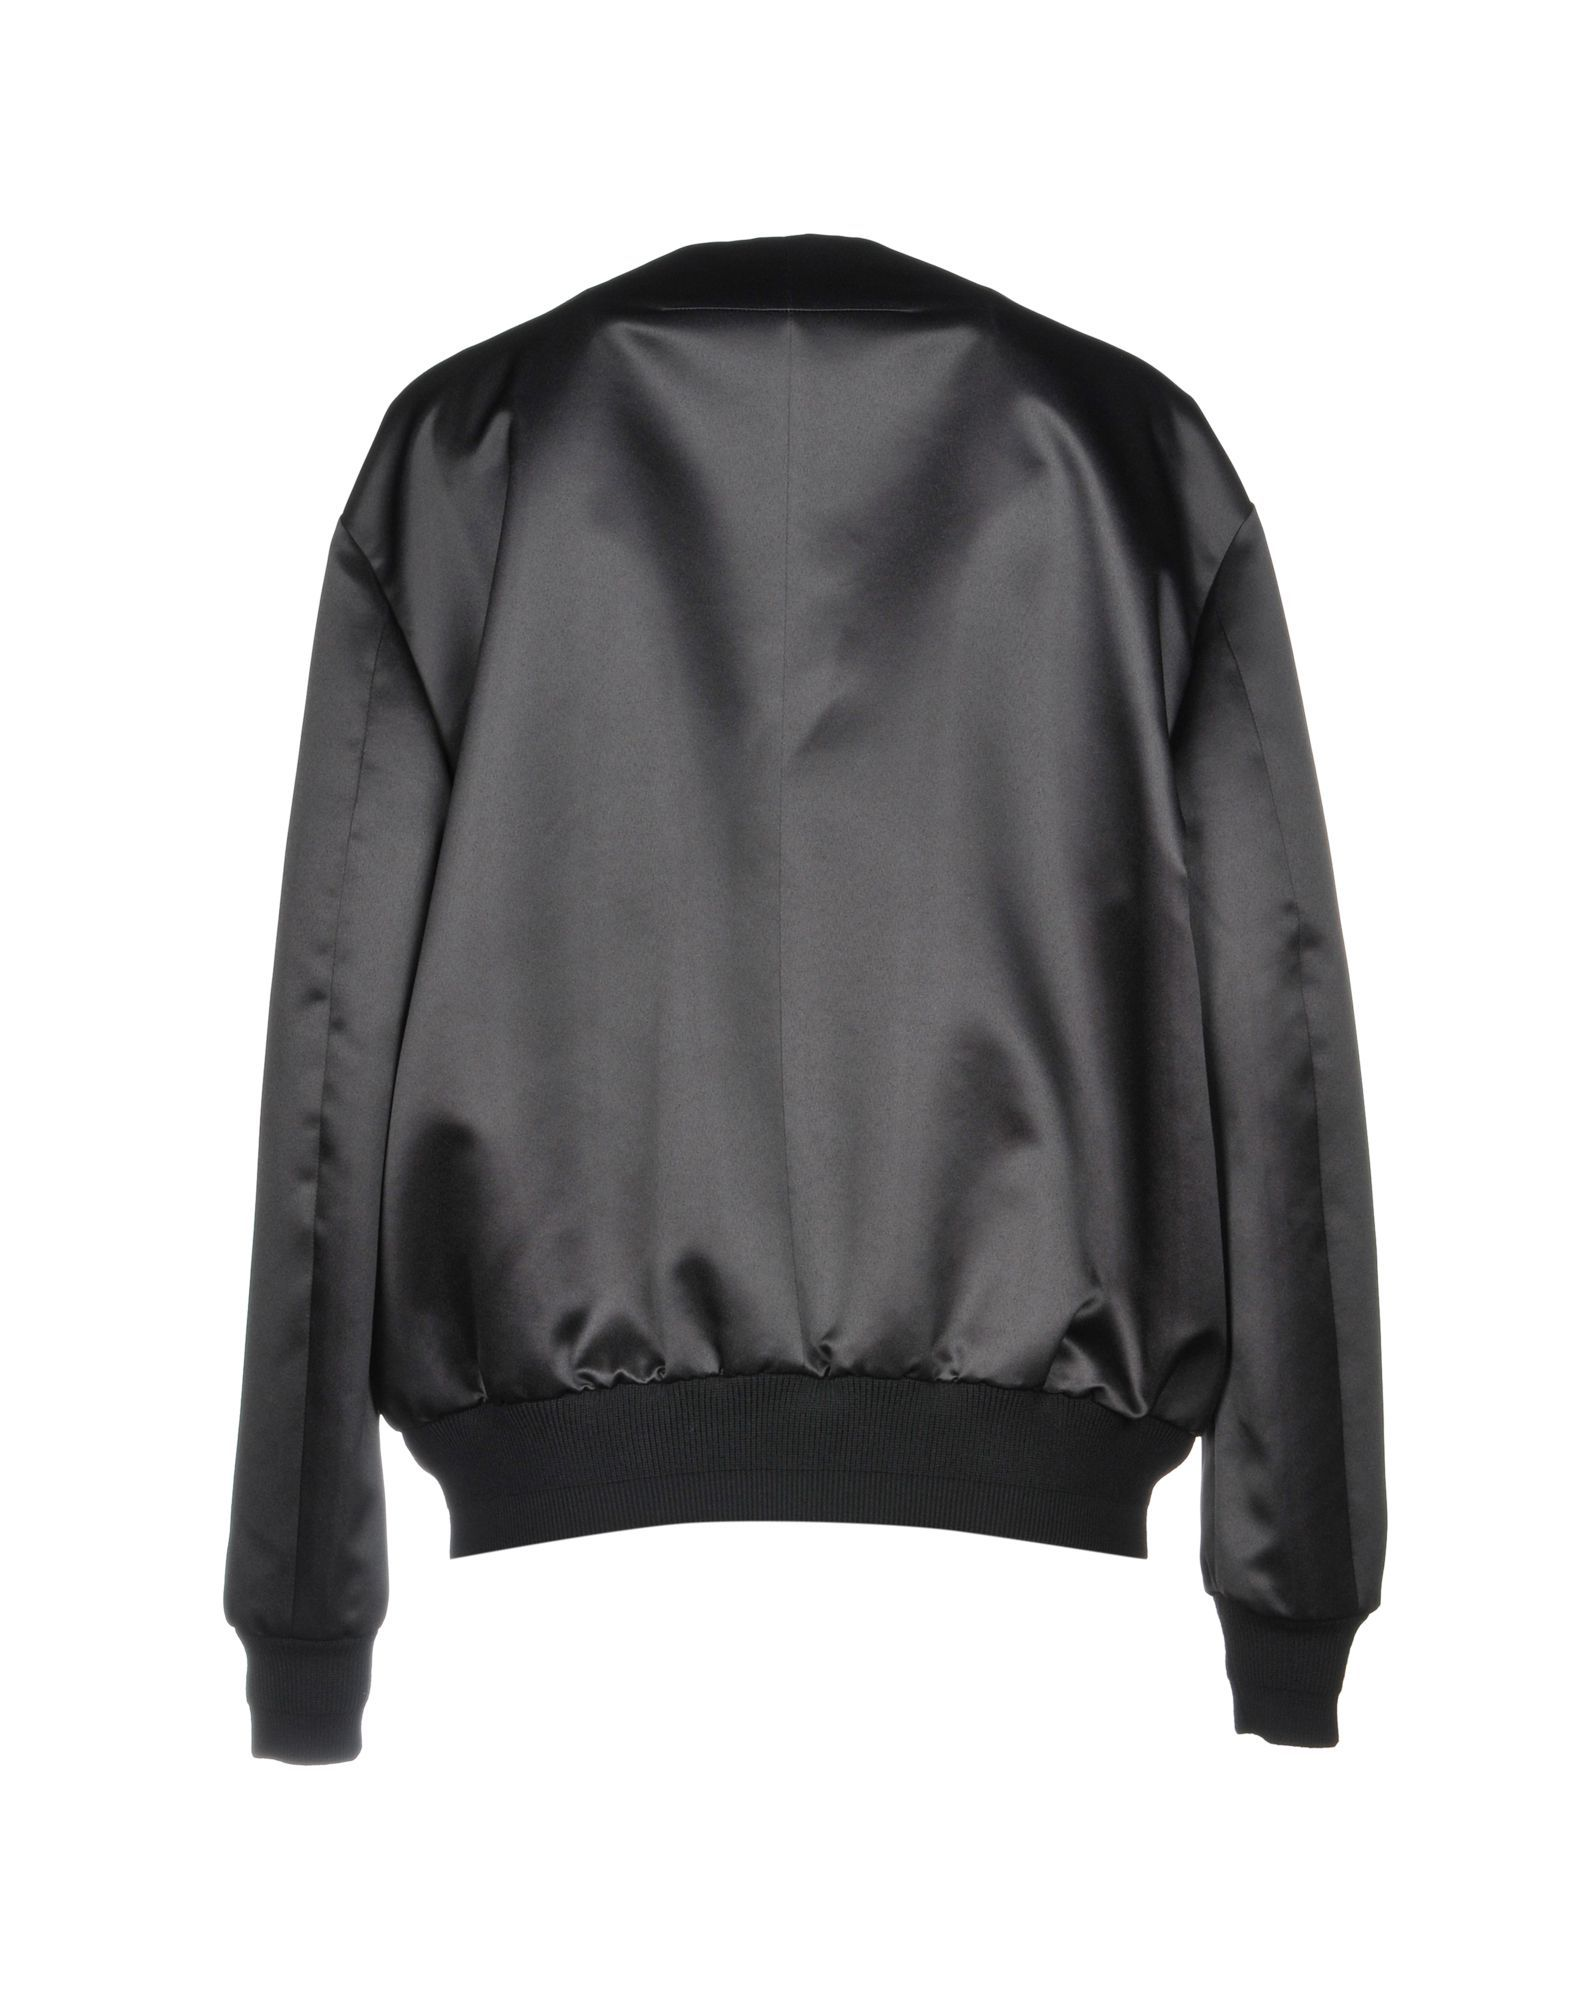 Givenchy Black Print Satin Jacket